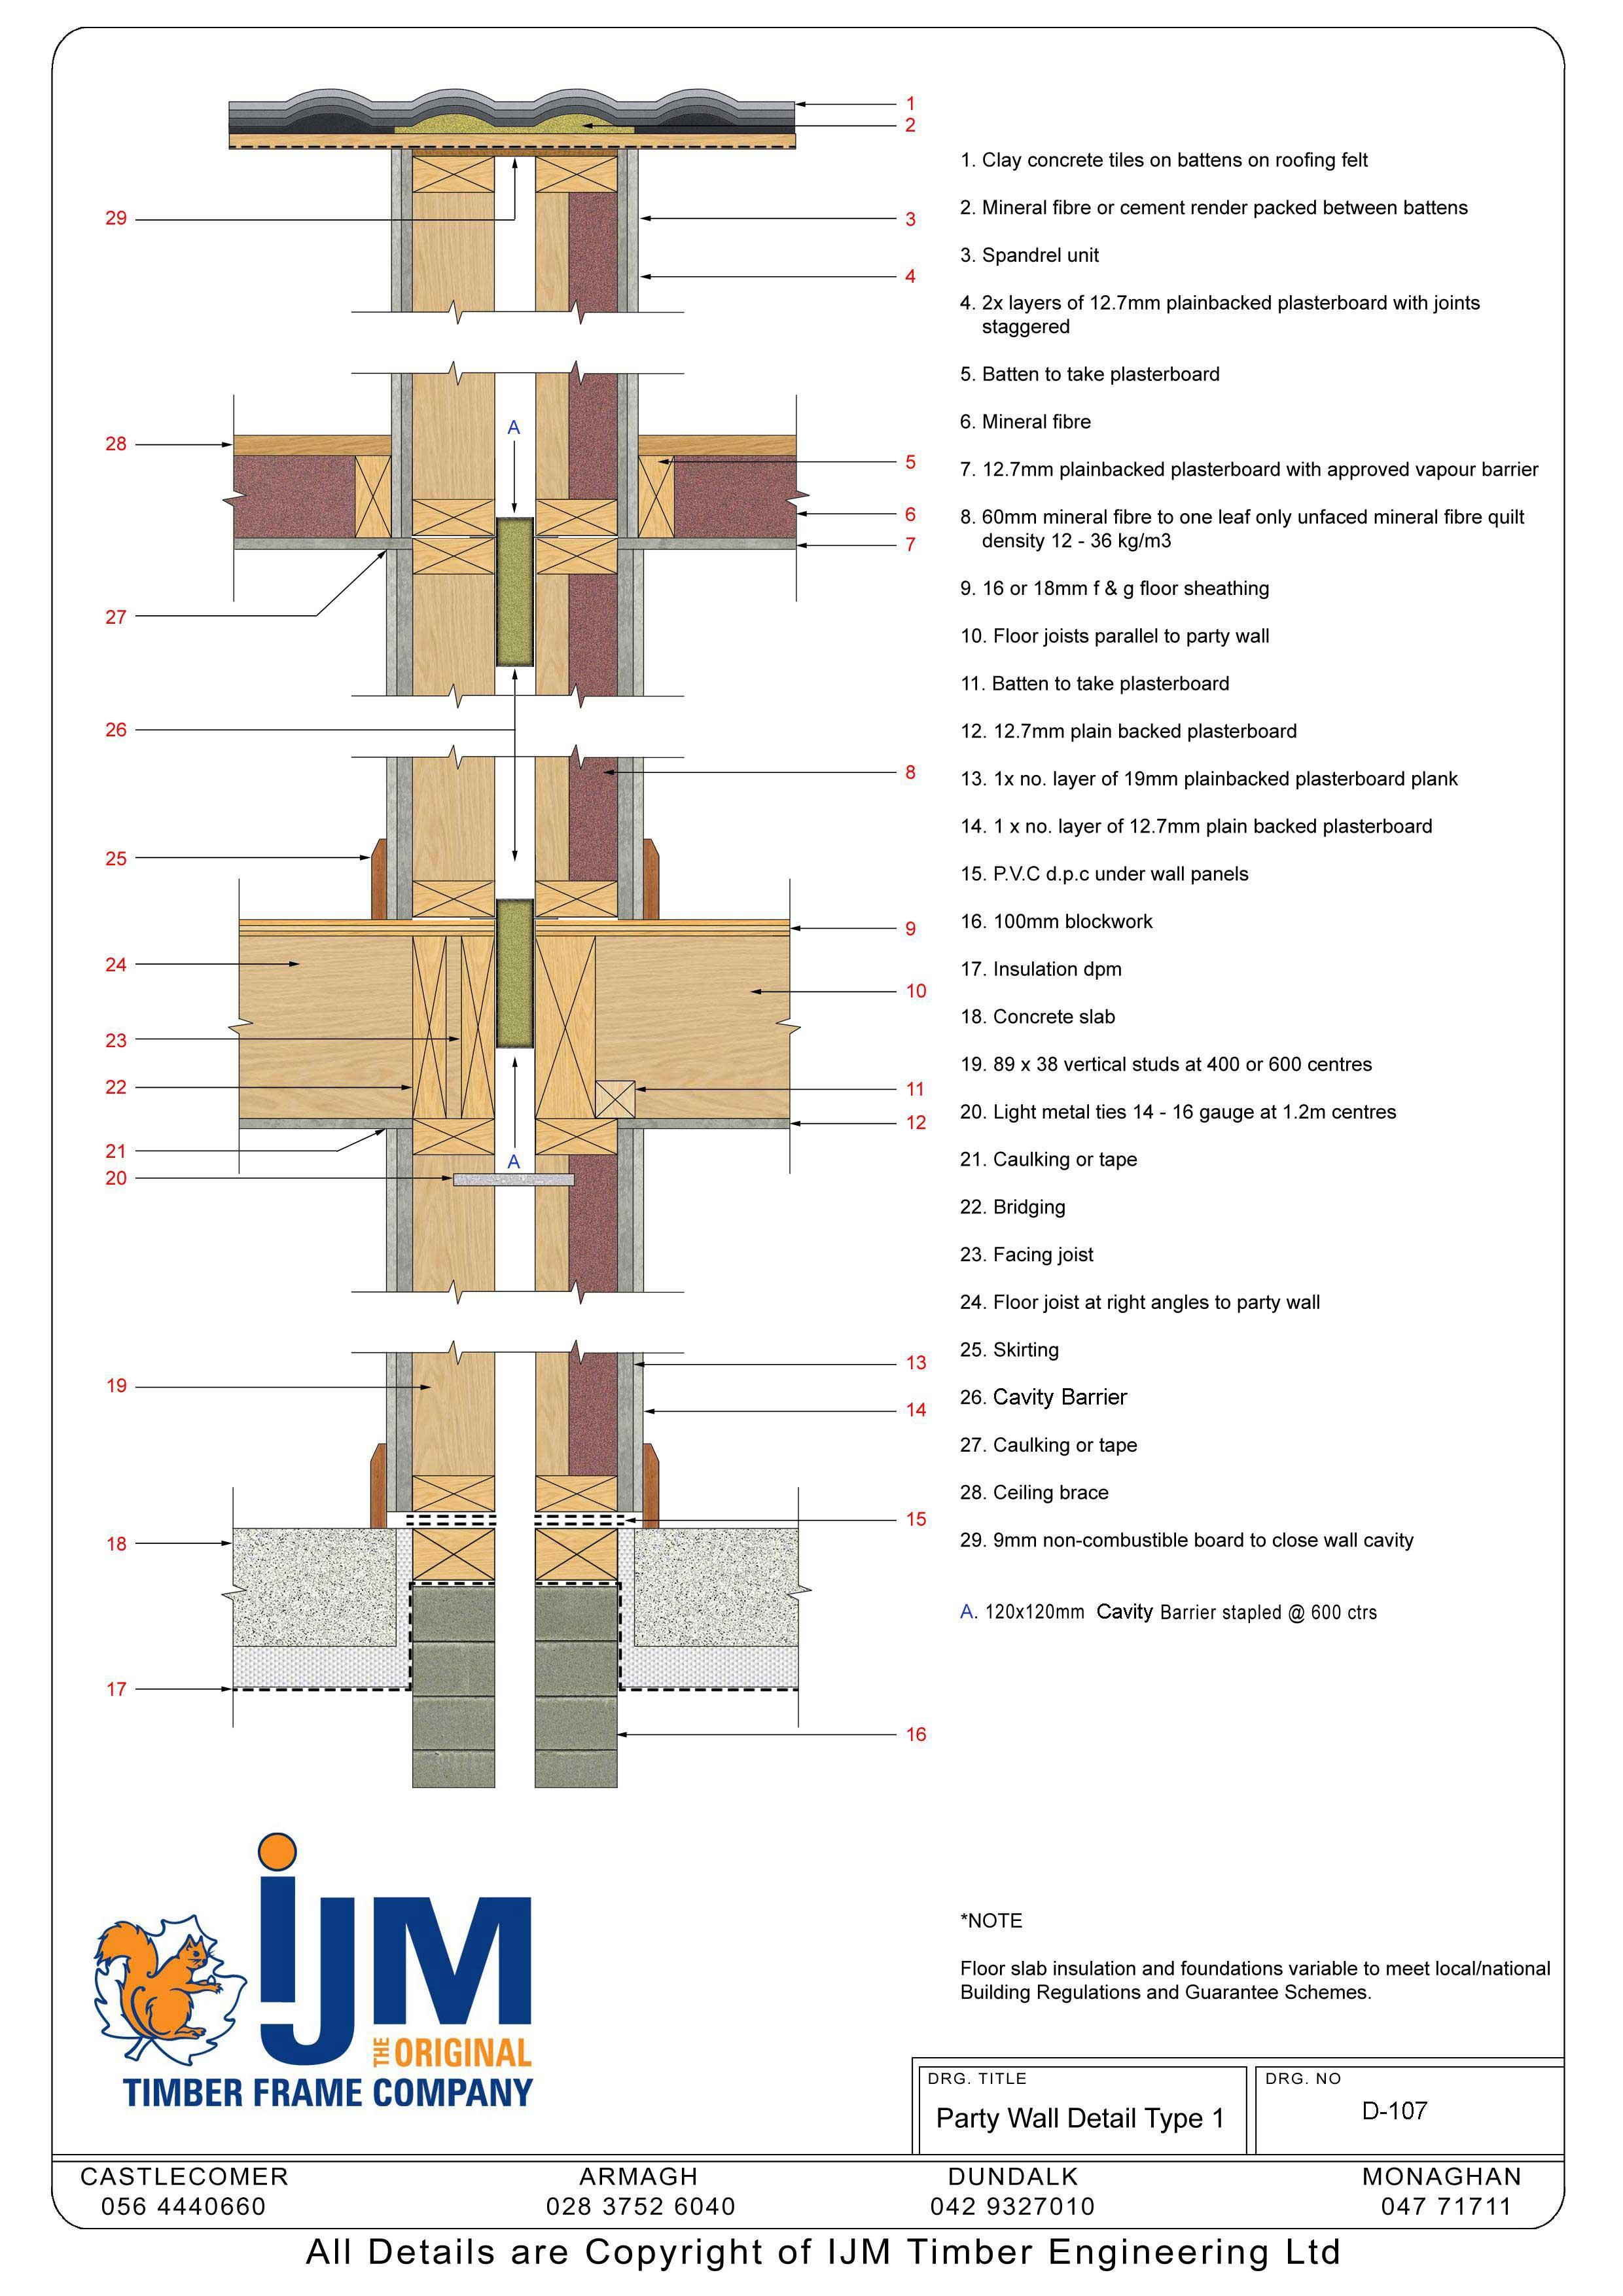 IJM Timberframe - Technical Details - Book of Details - Chapter 3